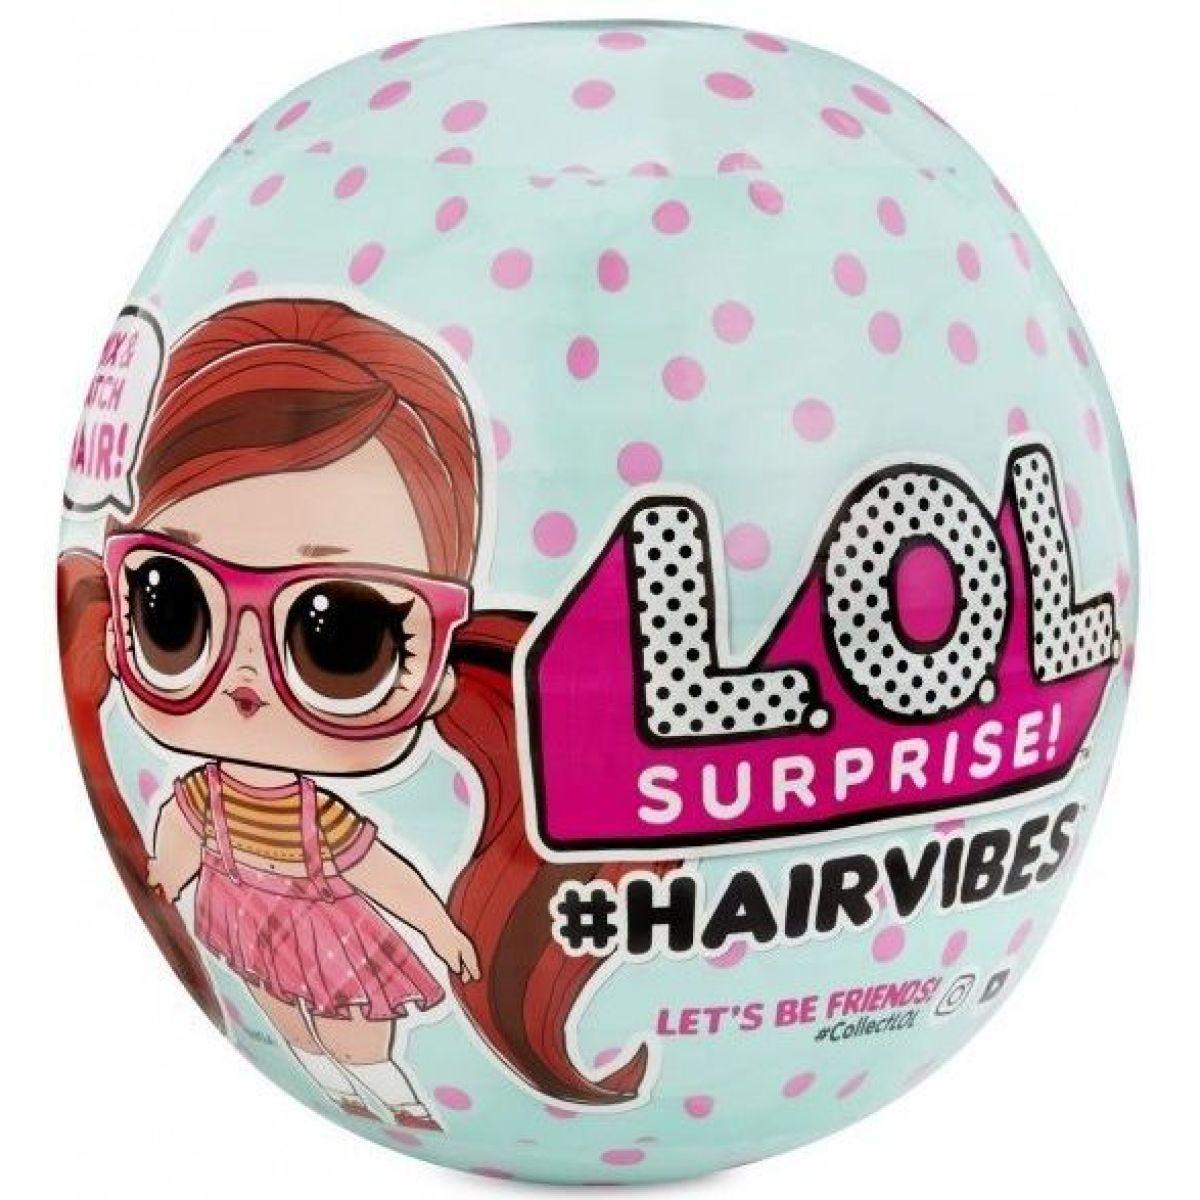 L.O.L. Surprise Hairvibes Česatice